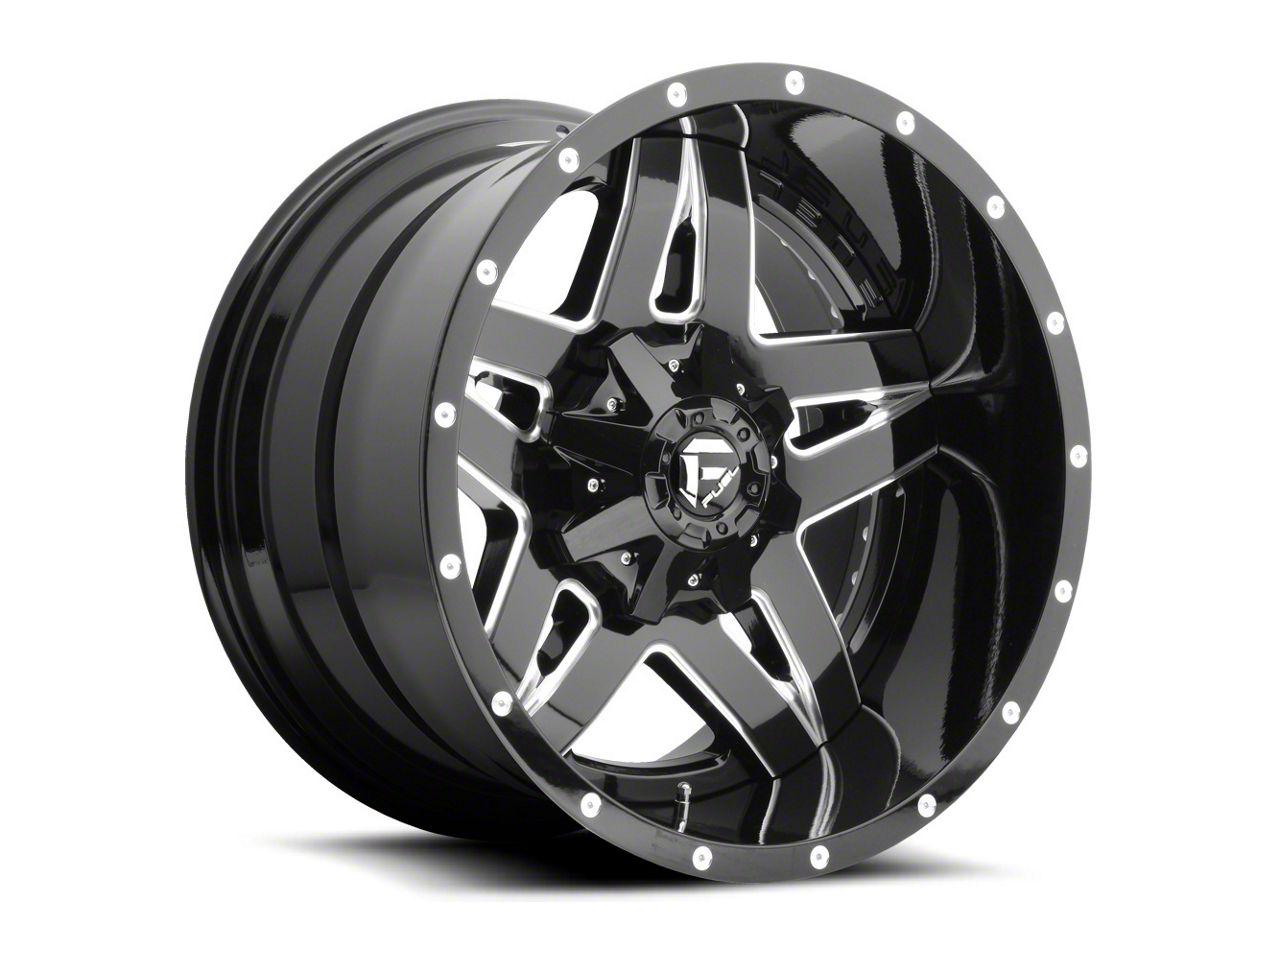 Fuel Wheels Full Blown Black Milled 6-Lug Wheel - 22x14 (07-18 Sierra 1500)